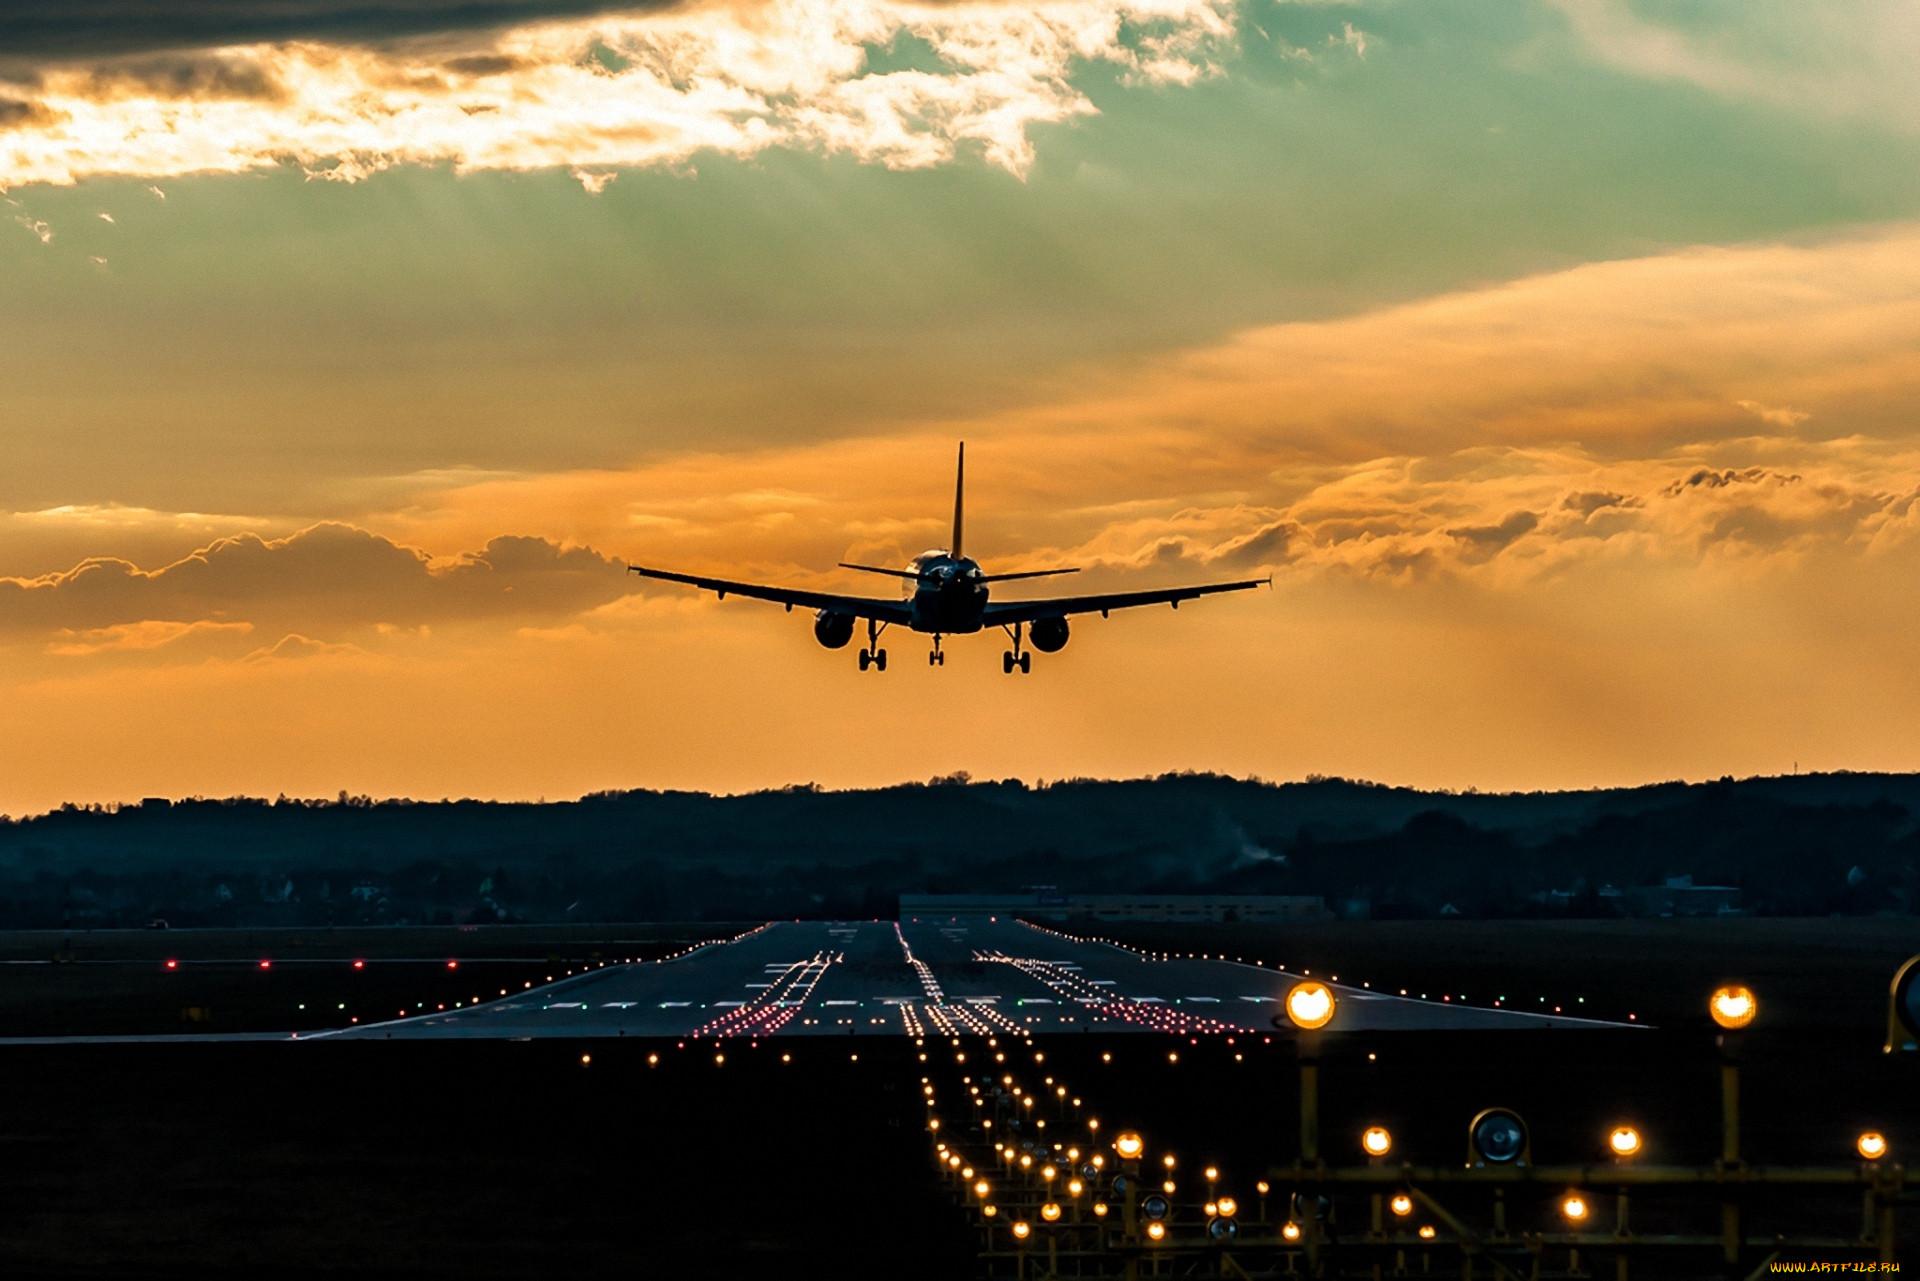 Улетающий самолет фото